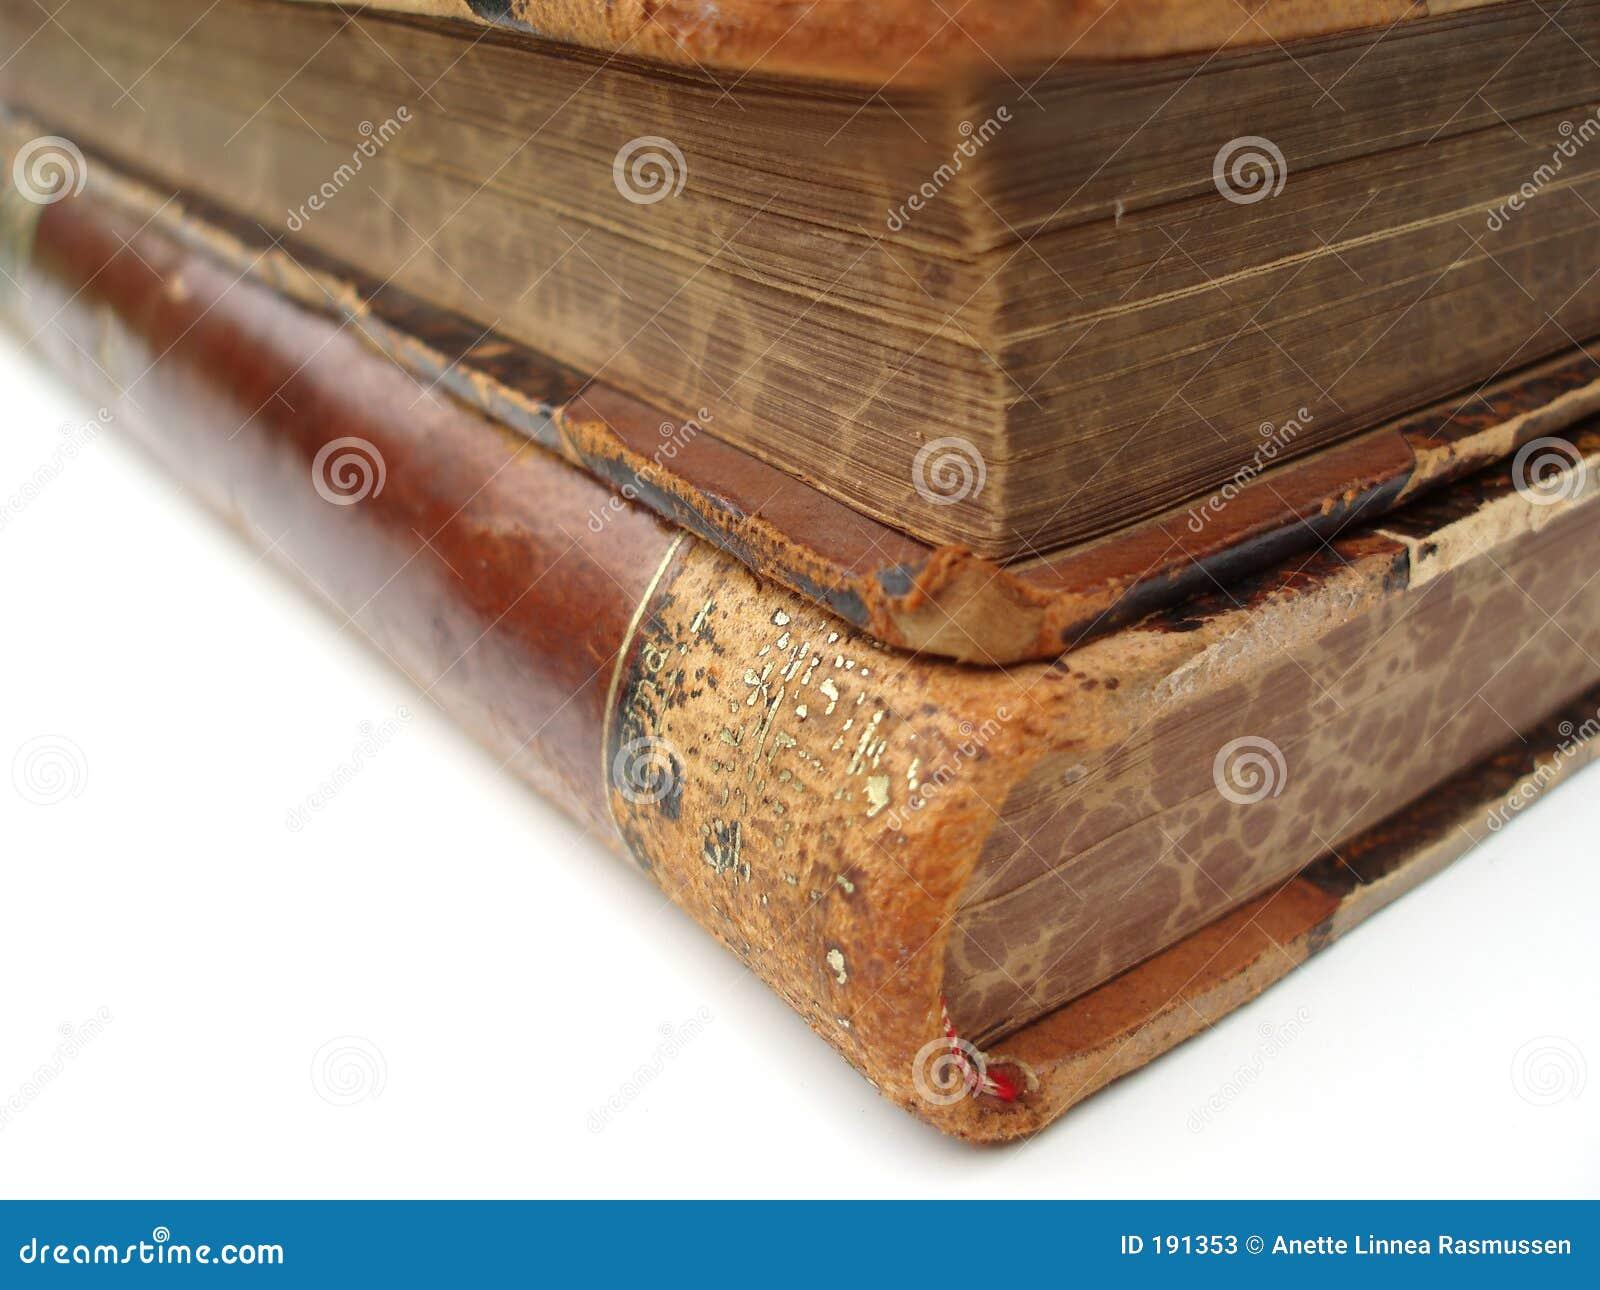 Esquina de dos libros viejos